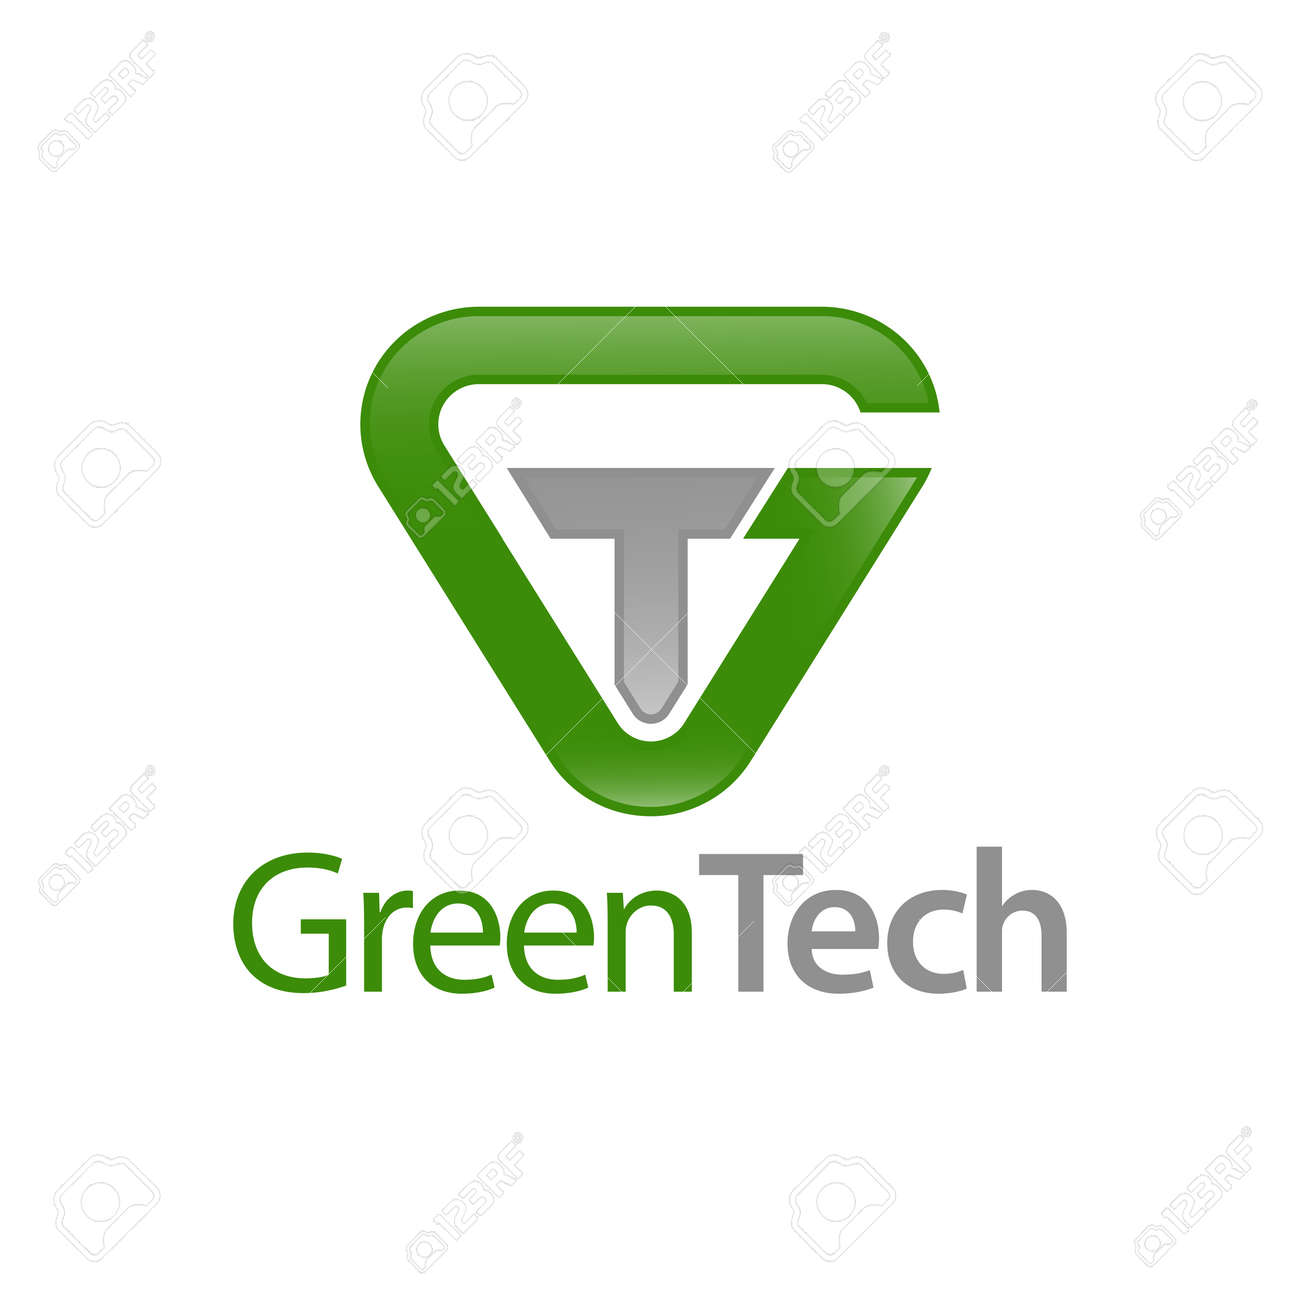 Green Tech. Triangle initial letter GT, TG logo concept design template idea - 143647308